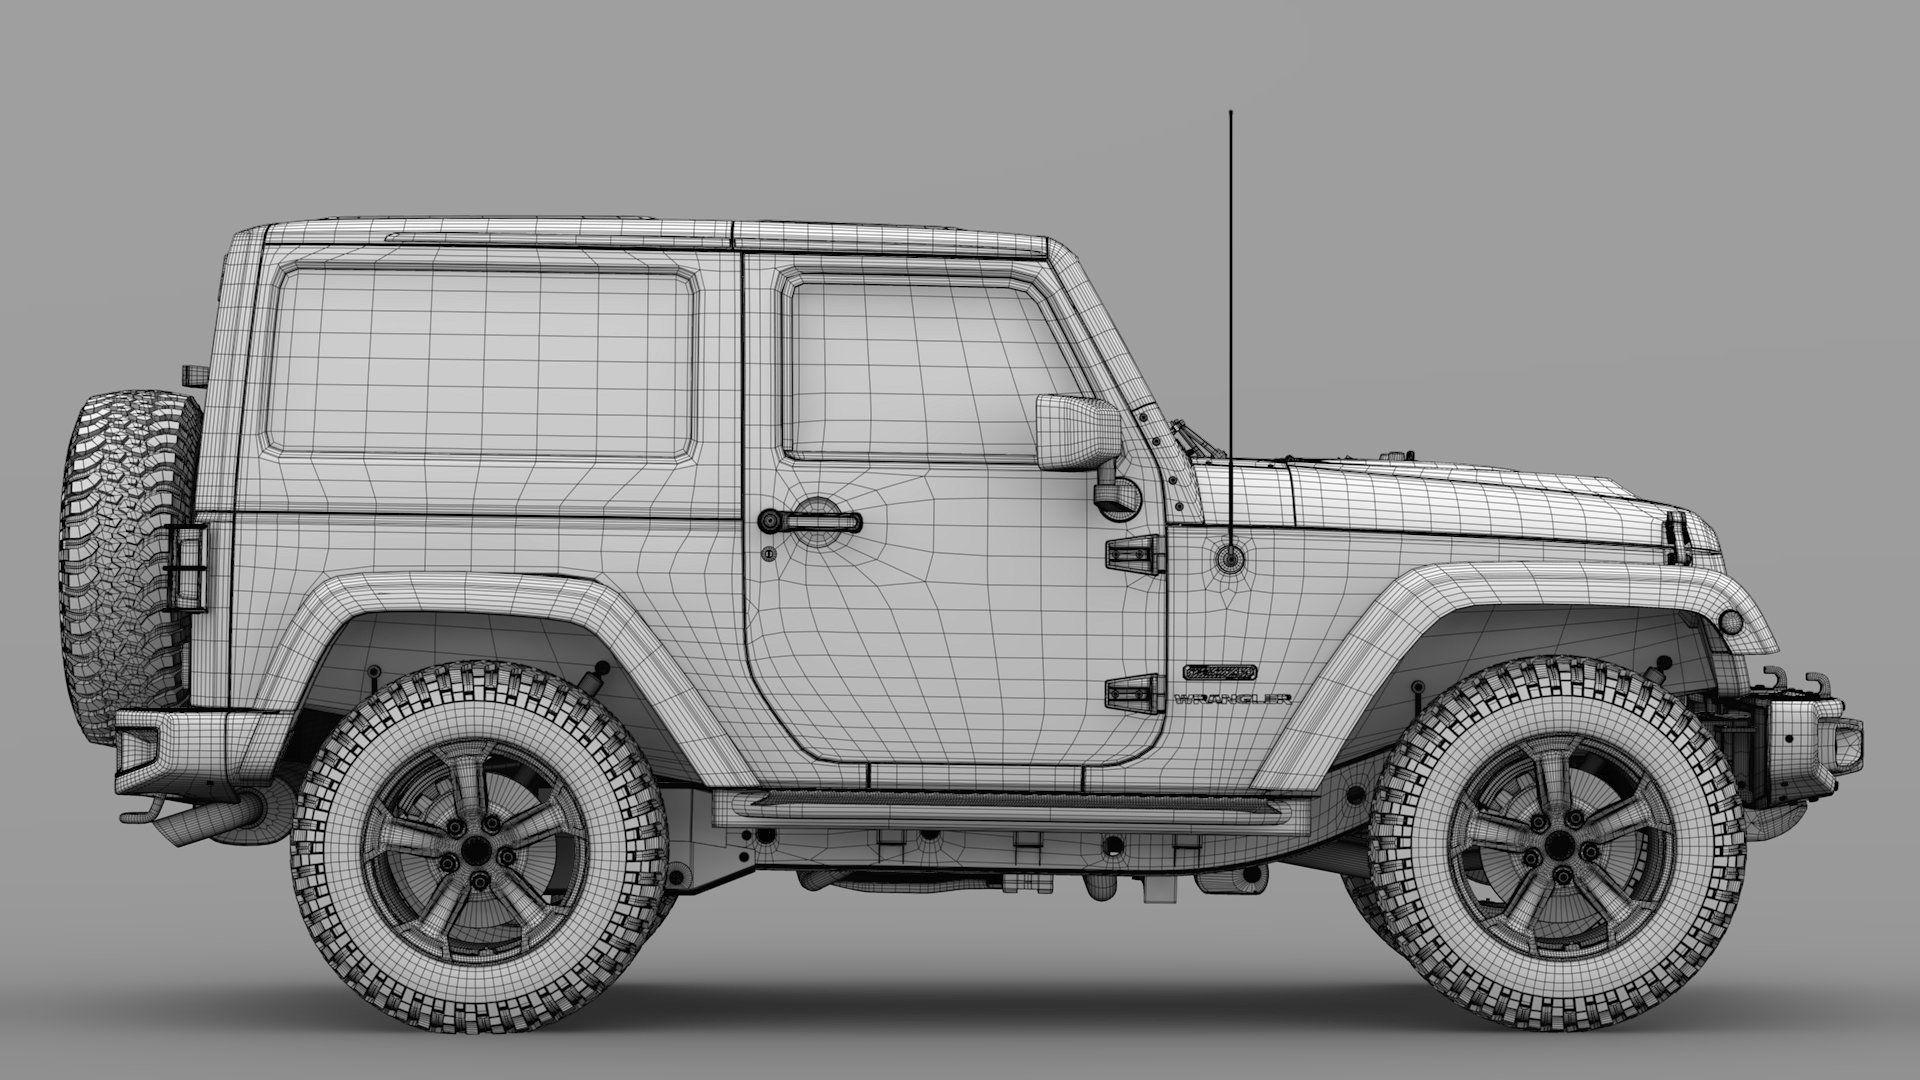 Jeep Wrangler Rubicon Recon Jk 2017 Jeep Wrangler Jeep Wrangler